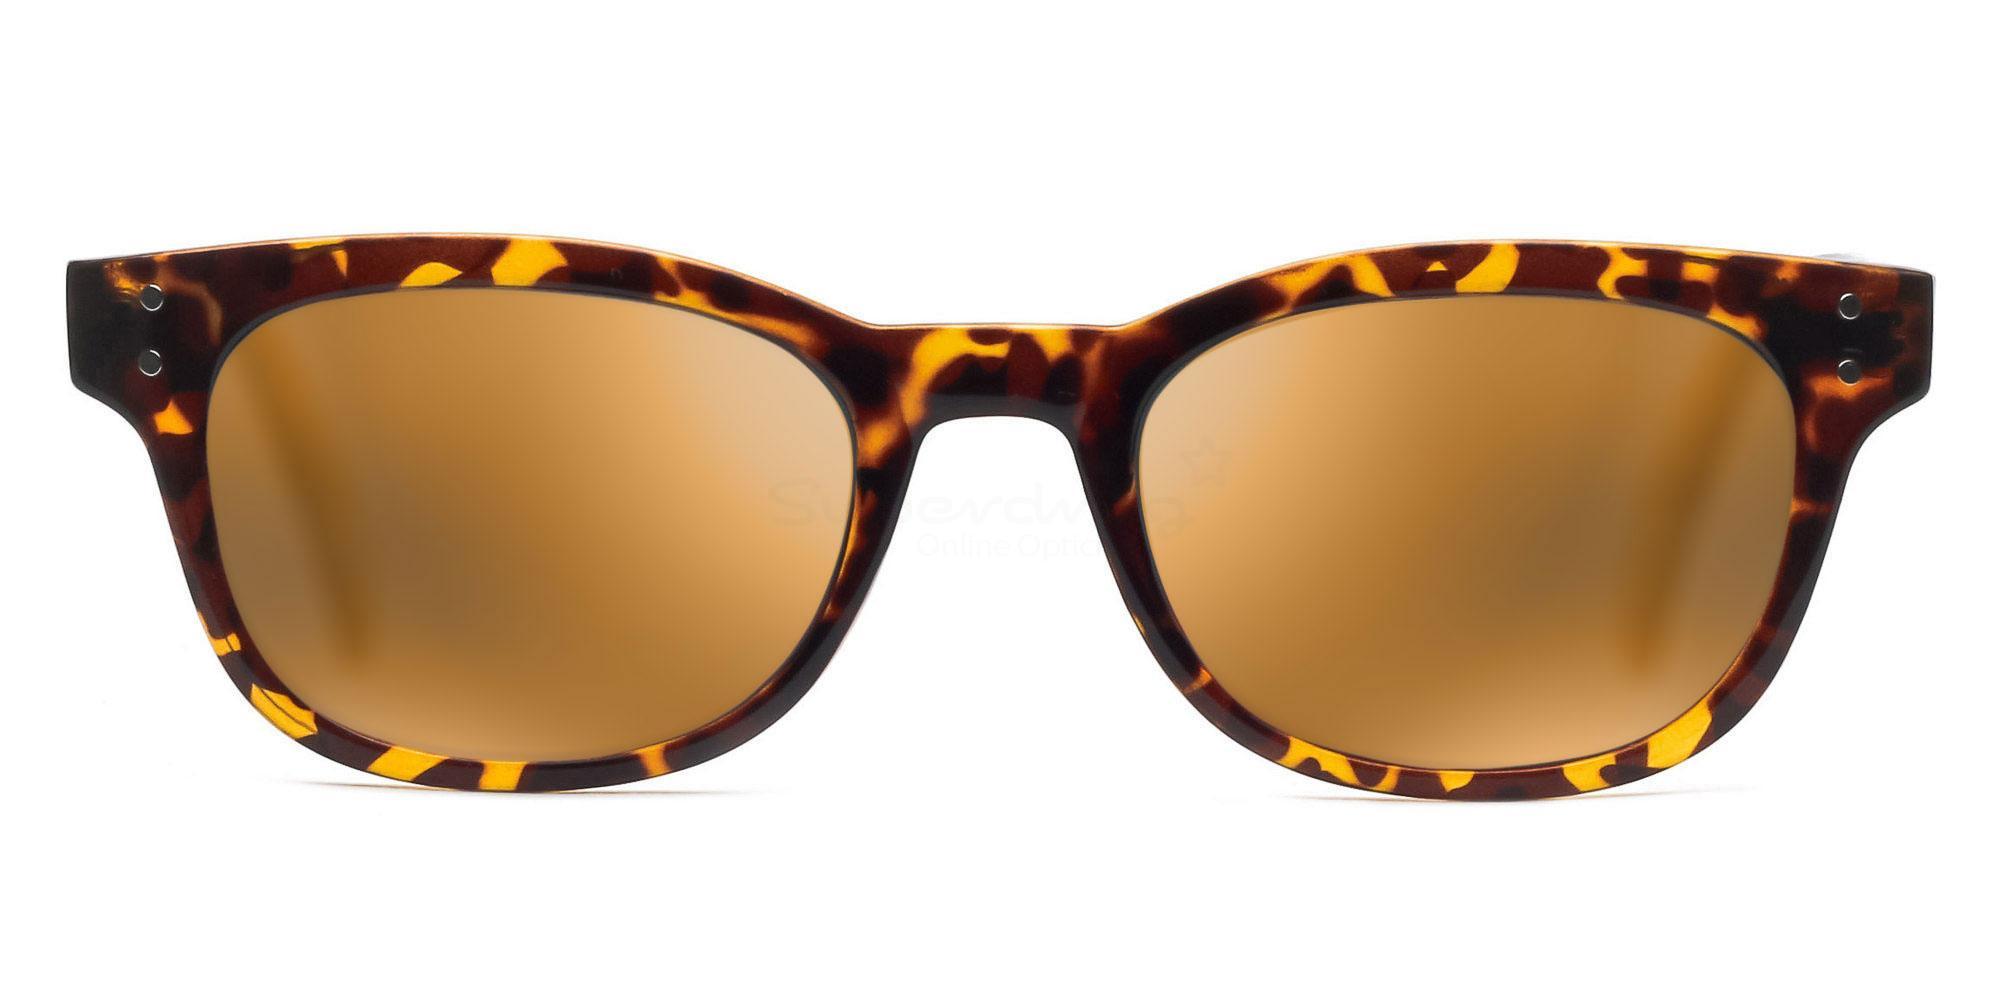 C04 Polarized Grey with Orange Mirror P2249 Havana (Mirrored Polarized) Sunglasses, Neon